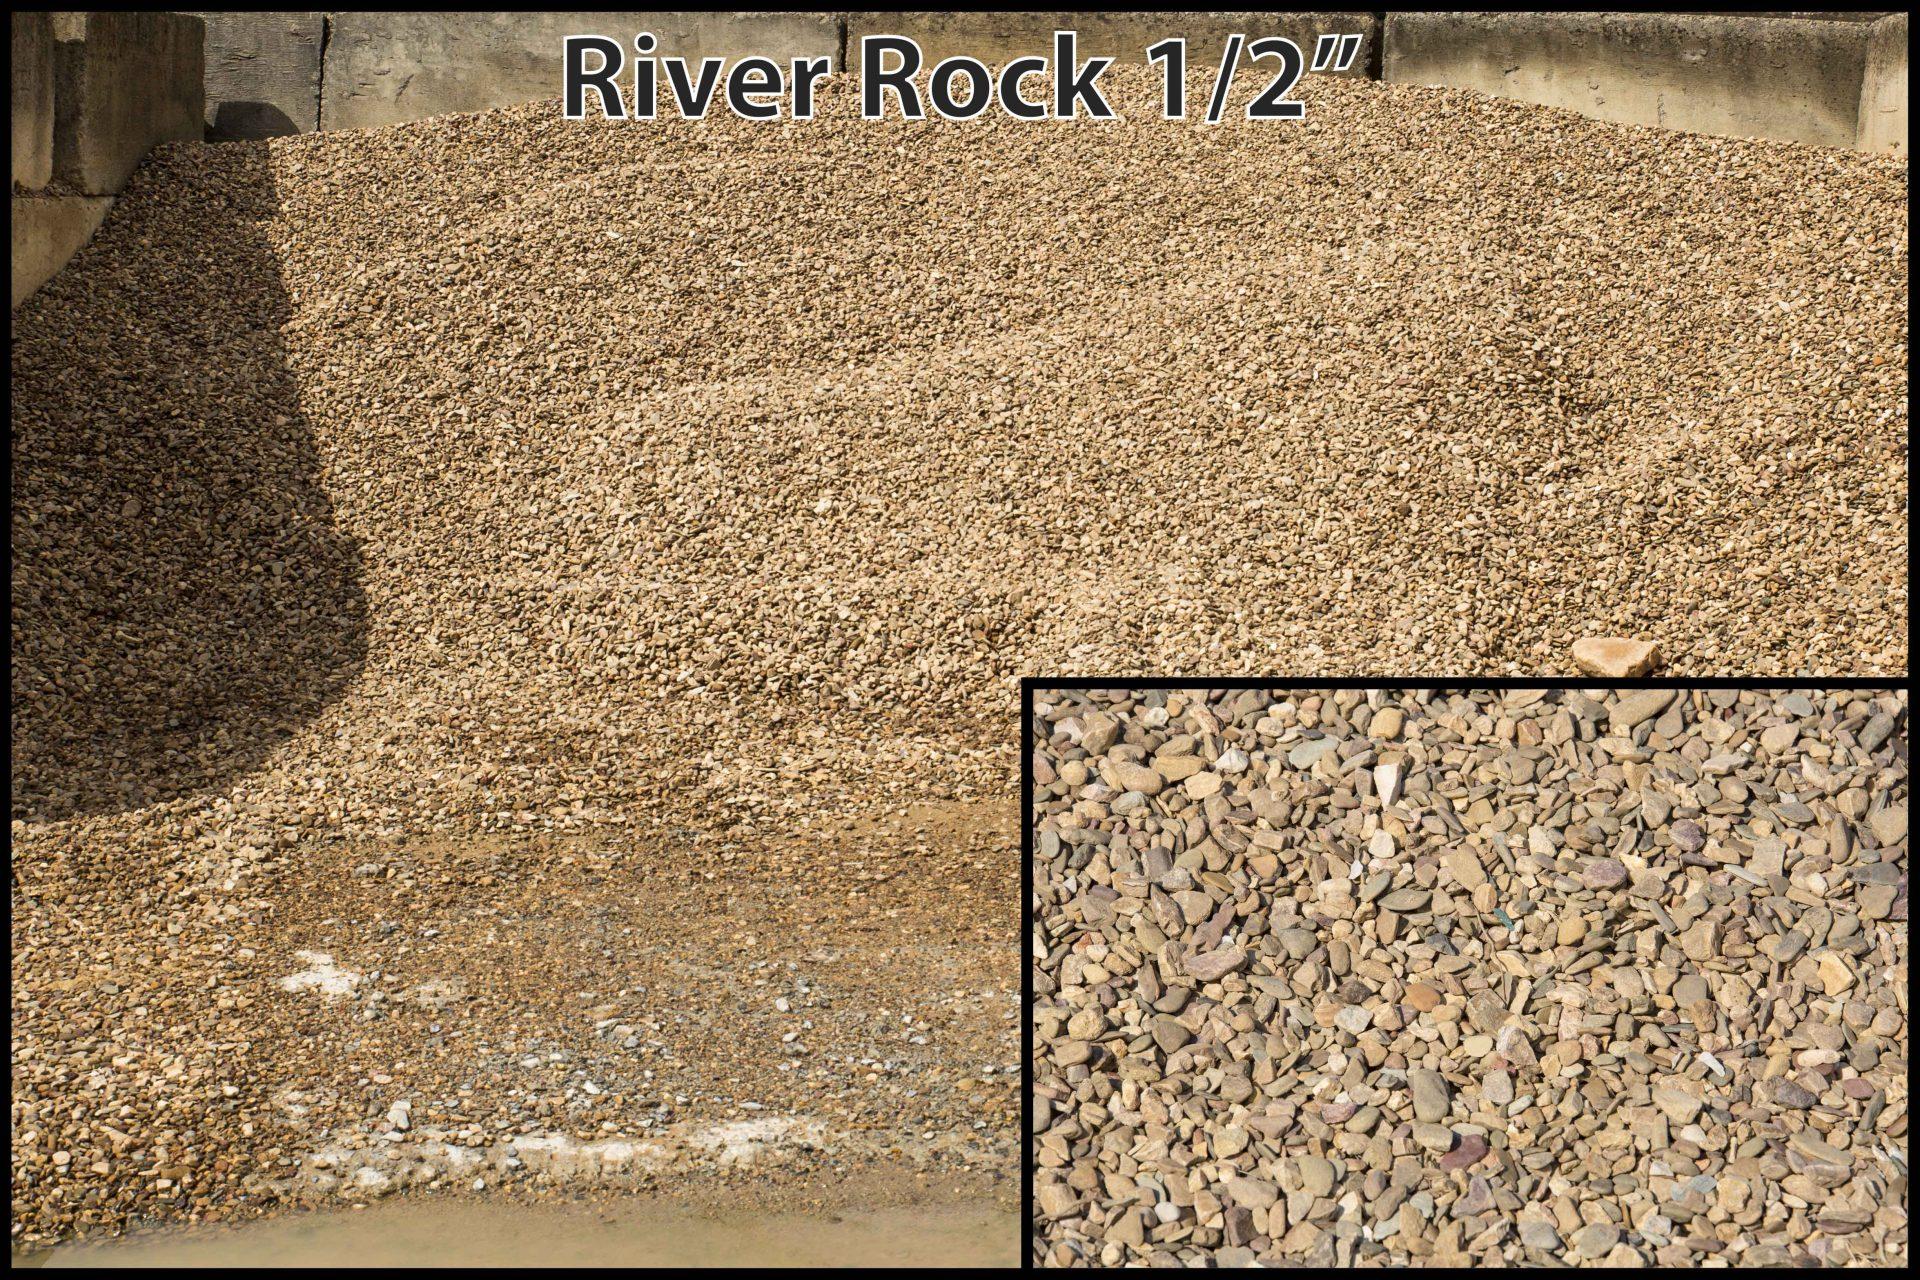 "River Rock 1/2′"""